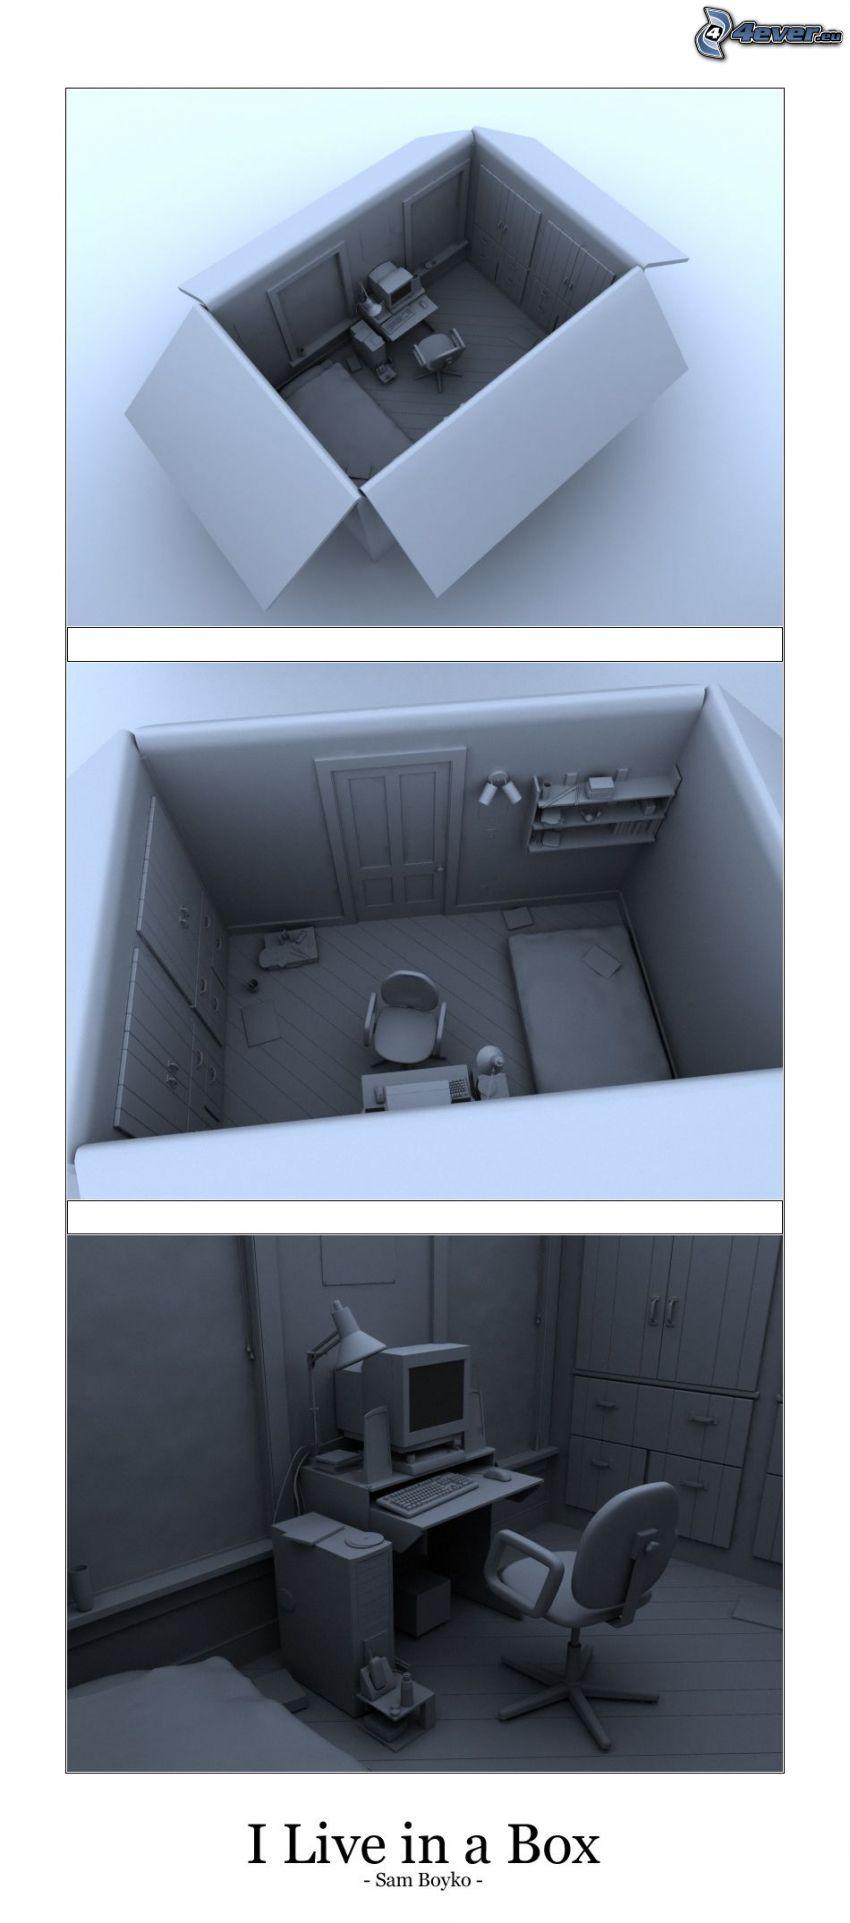 låda, rum